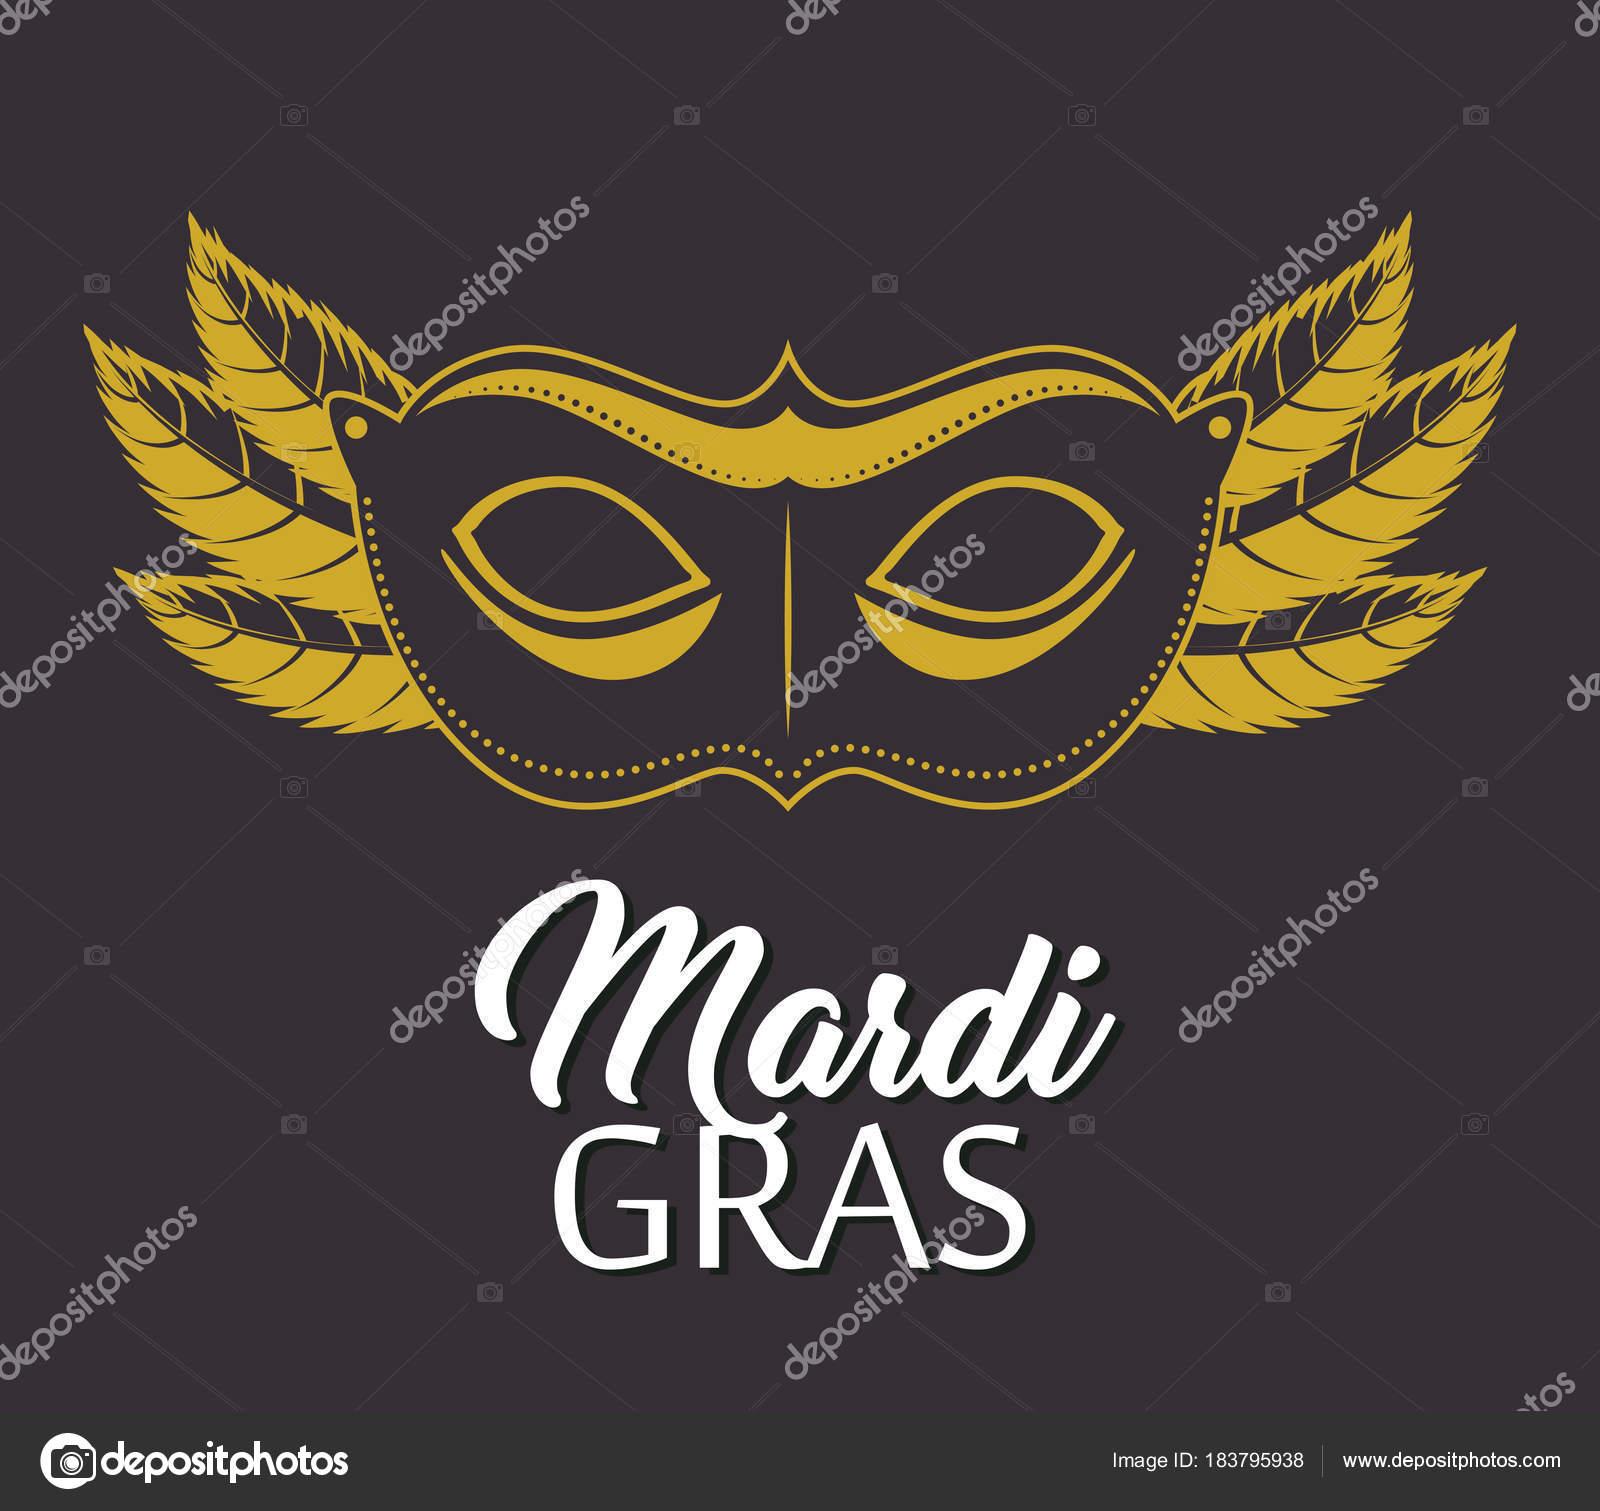 6aa0ce38e Mardi gras nápisy plakát s transparentem, karneval maska vektorová  ilustrace grafický design — Vektor od ...